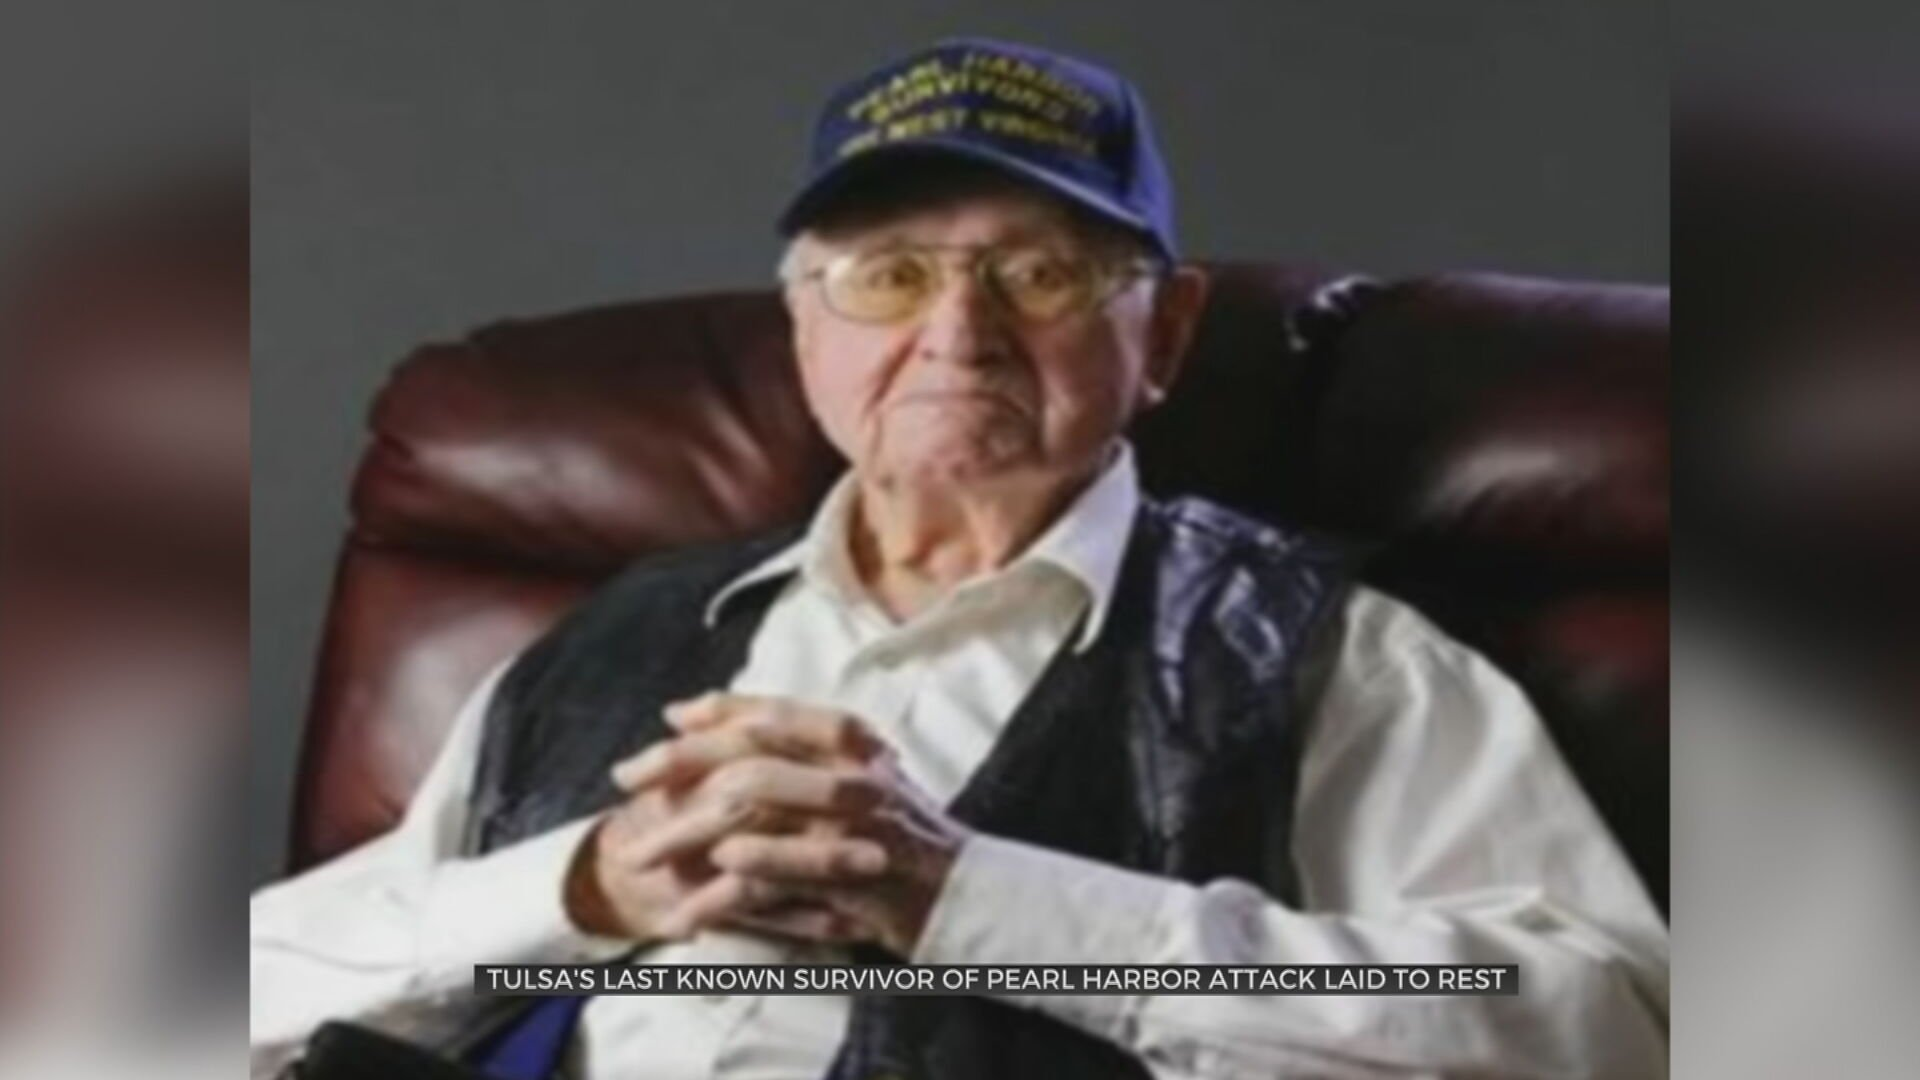 Tulsa's Last Known Survivor Of Pearl Harbor Attack Laid To Rest